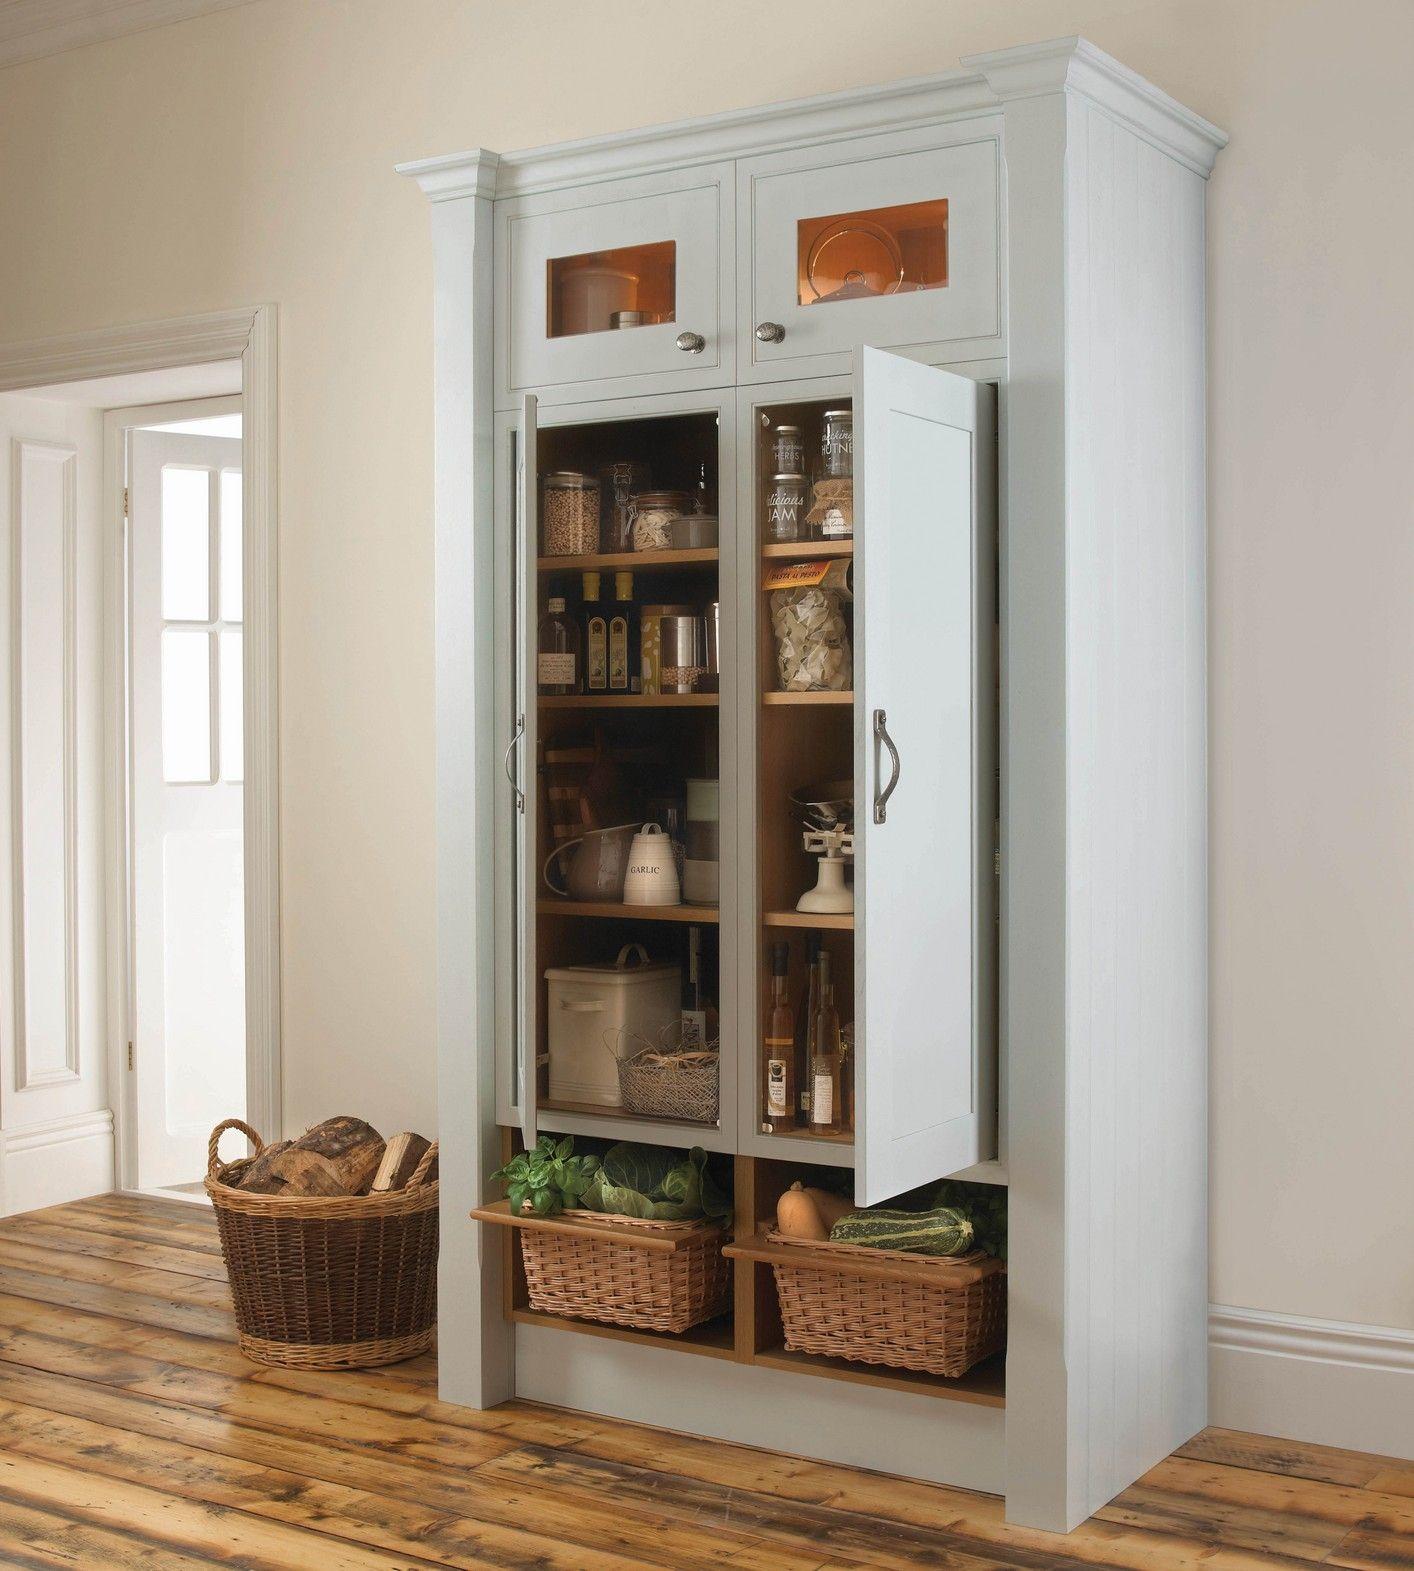 Kitchen Cabinet Stackable Storage Units Kitchen Ideas In 2020 Free Standing Kitchen Cabinets Kitchen Standing Cabinet Kitchen Pantry Cabinet Freestanding